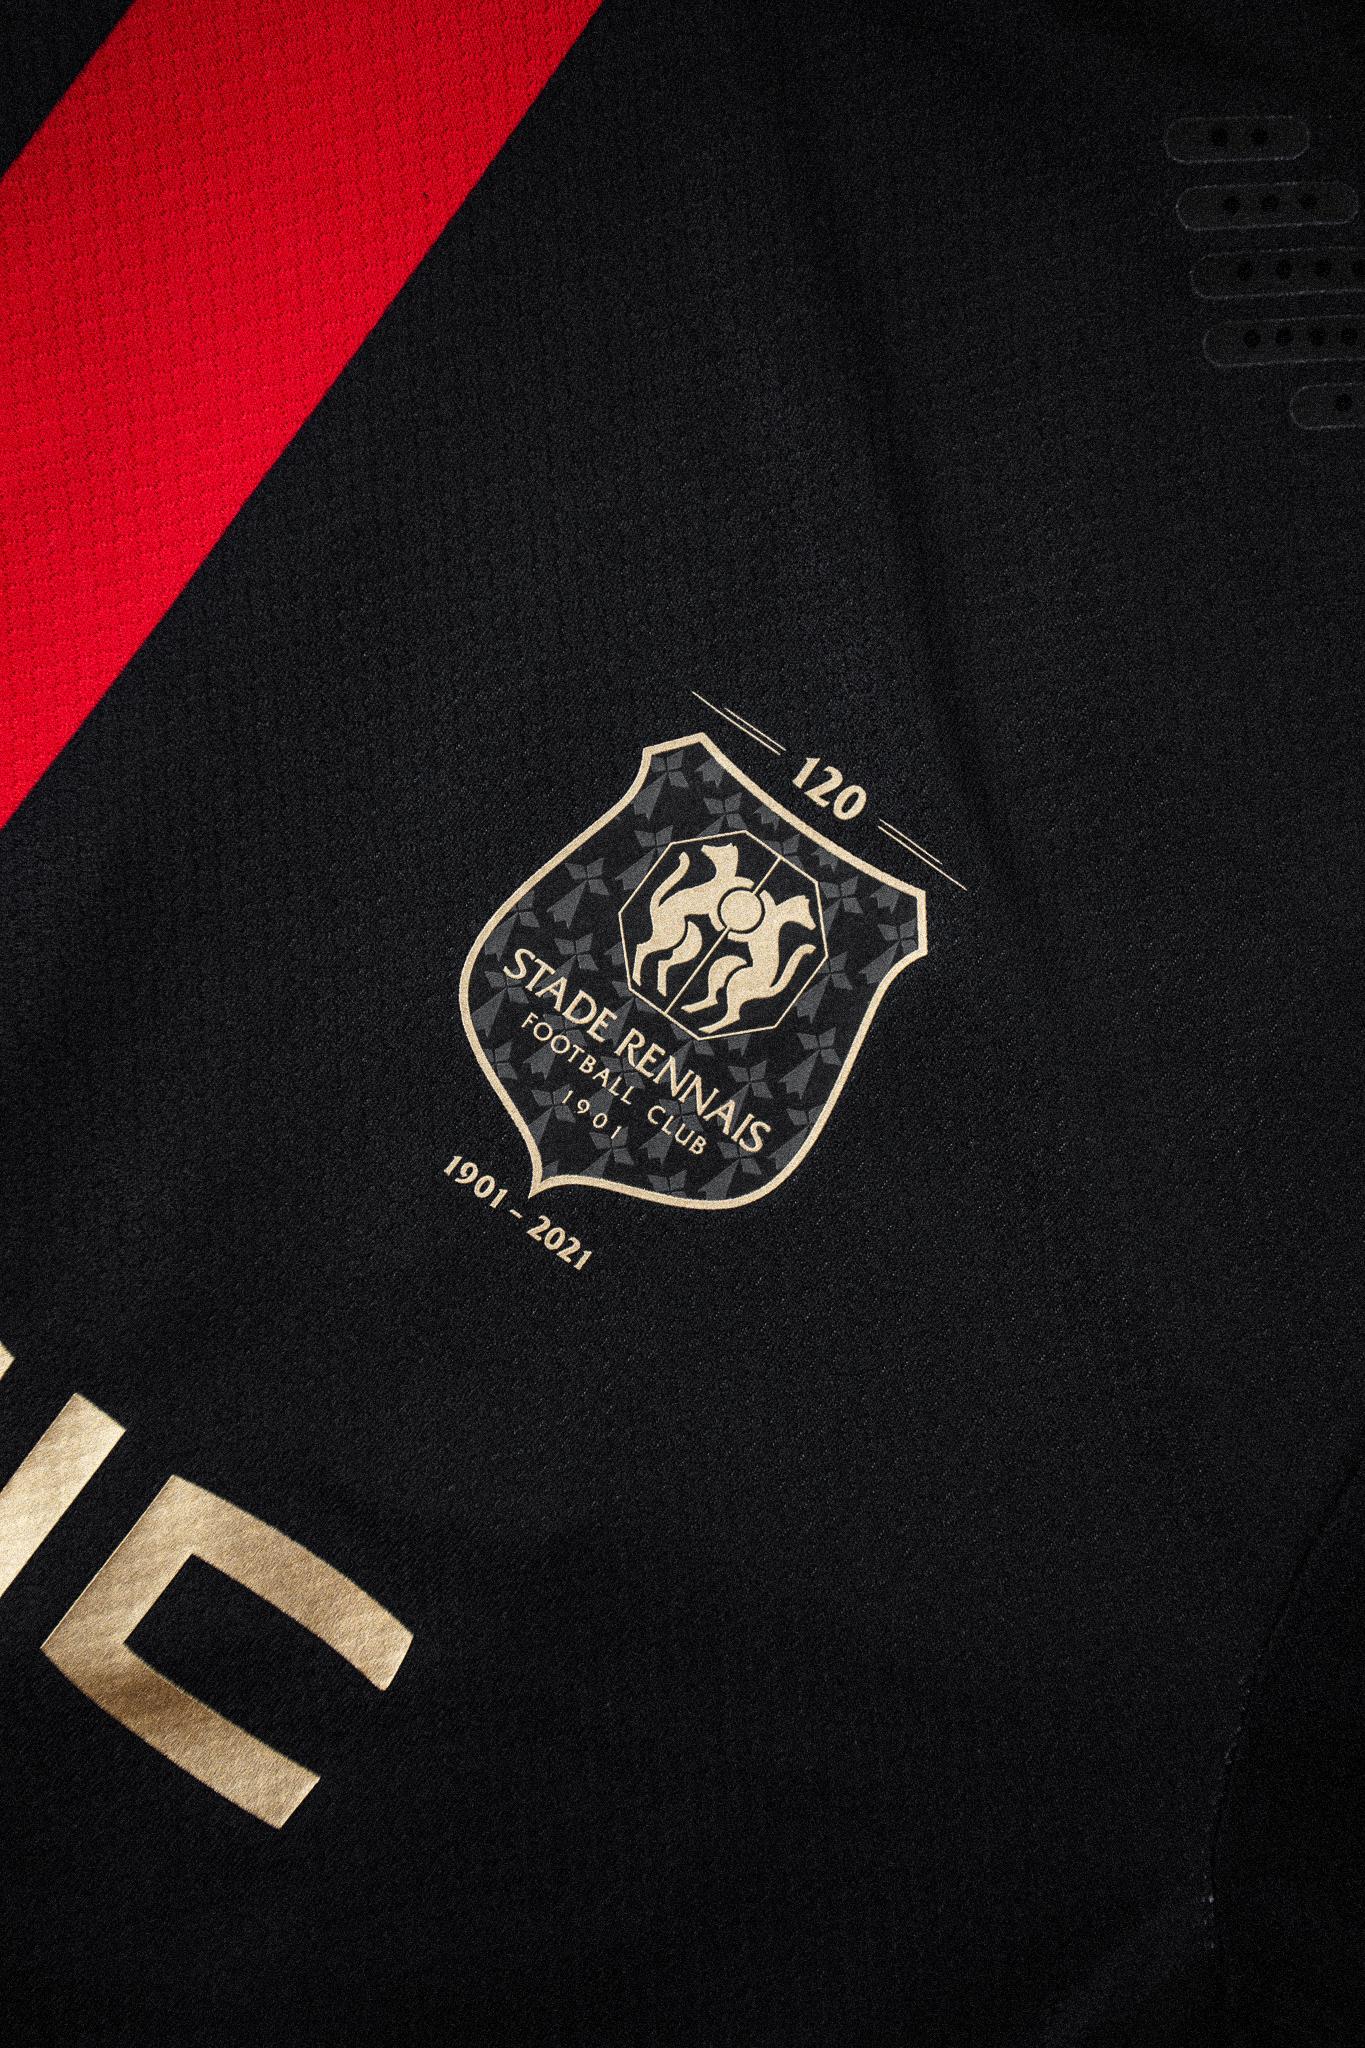 maillot-stade-rennais-anniversaire-120-ans-puma-15